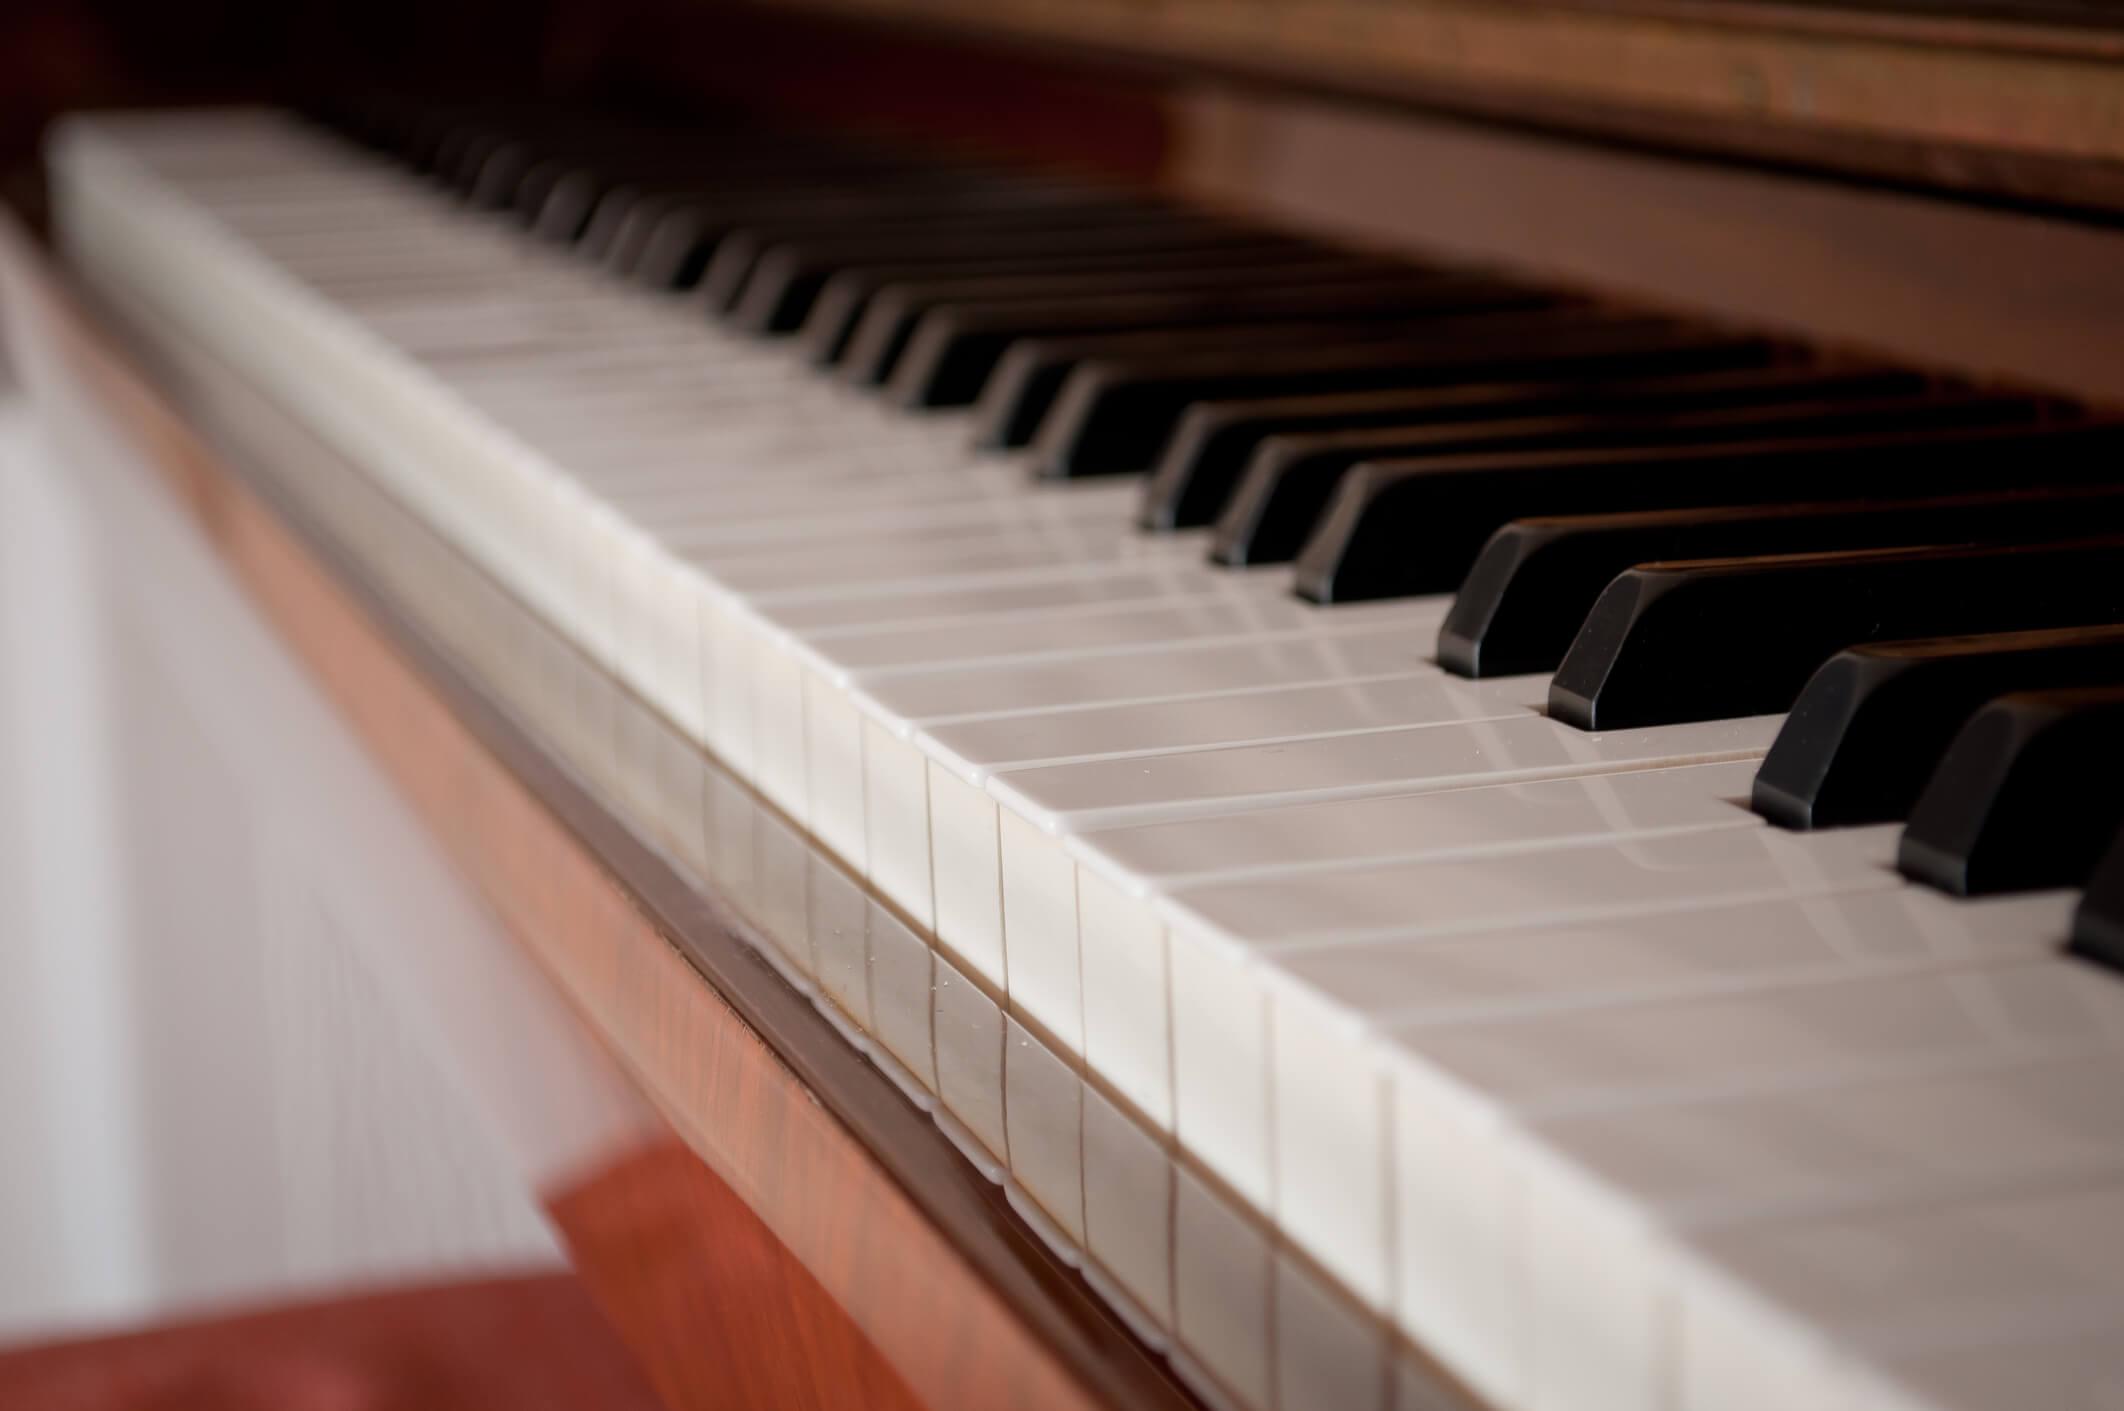 Piano Keys close up.